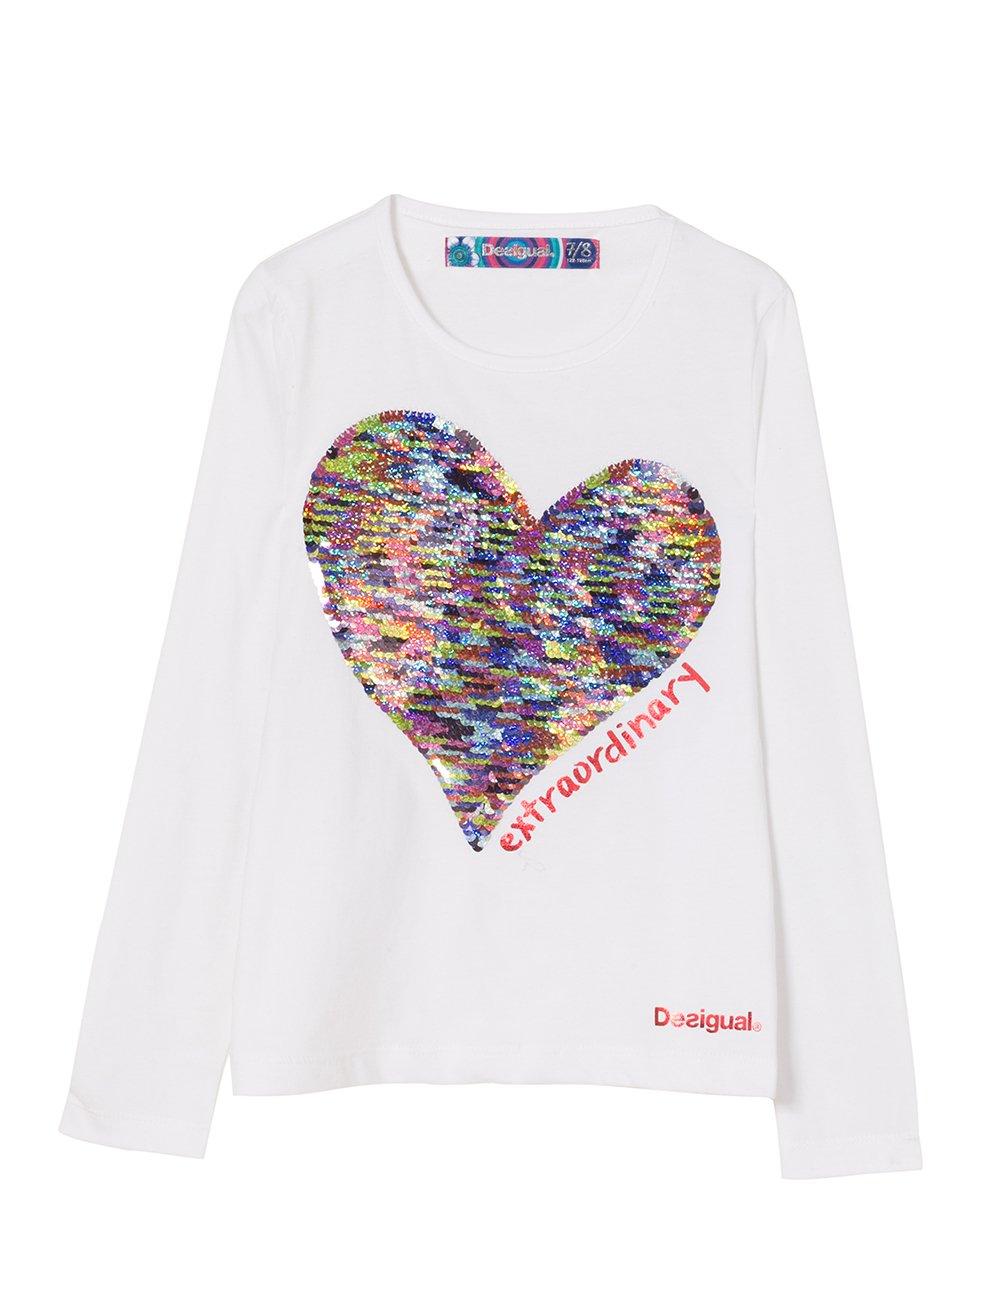 Desigual TS_Vancouver Camisa Manga Larga para Niñas